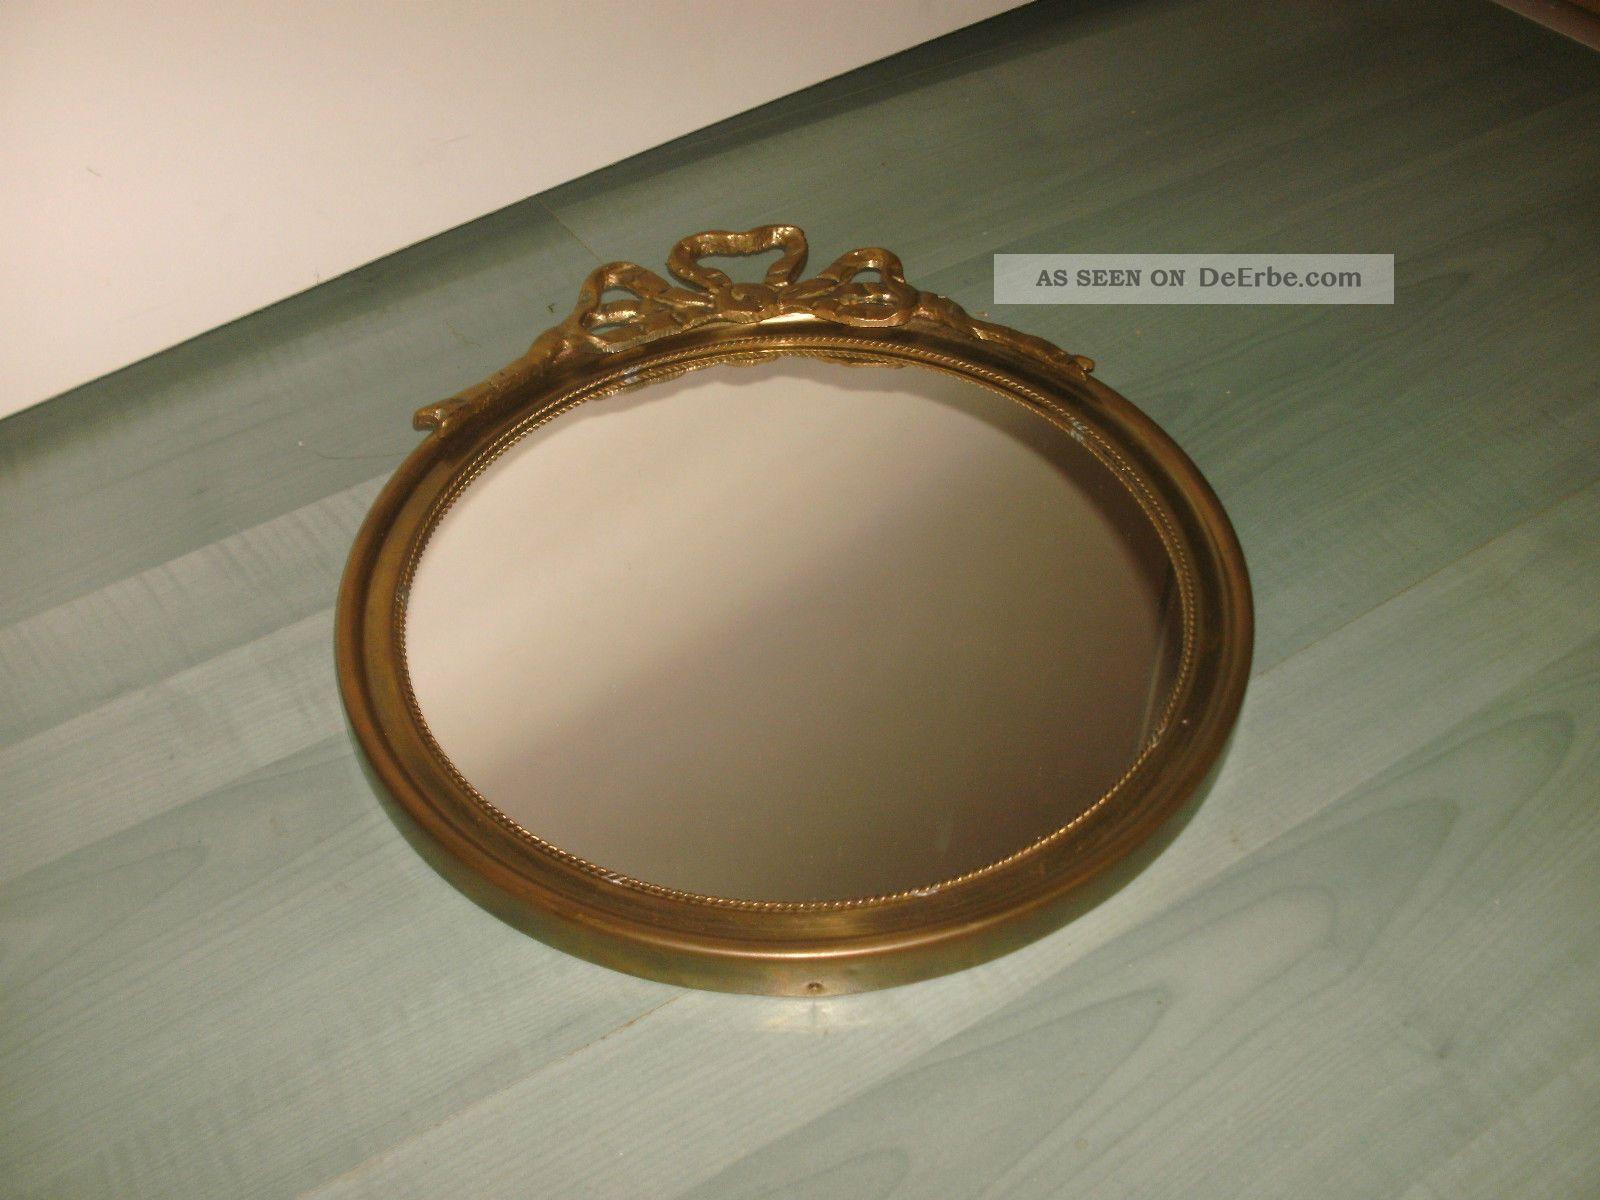 spiegel aus messing messingspiegel im biedermeierstil. Black Bedroom Furniture Sets. Home Design Ideas